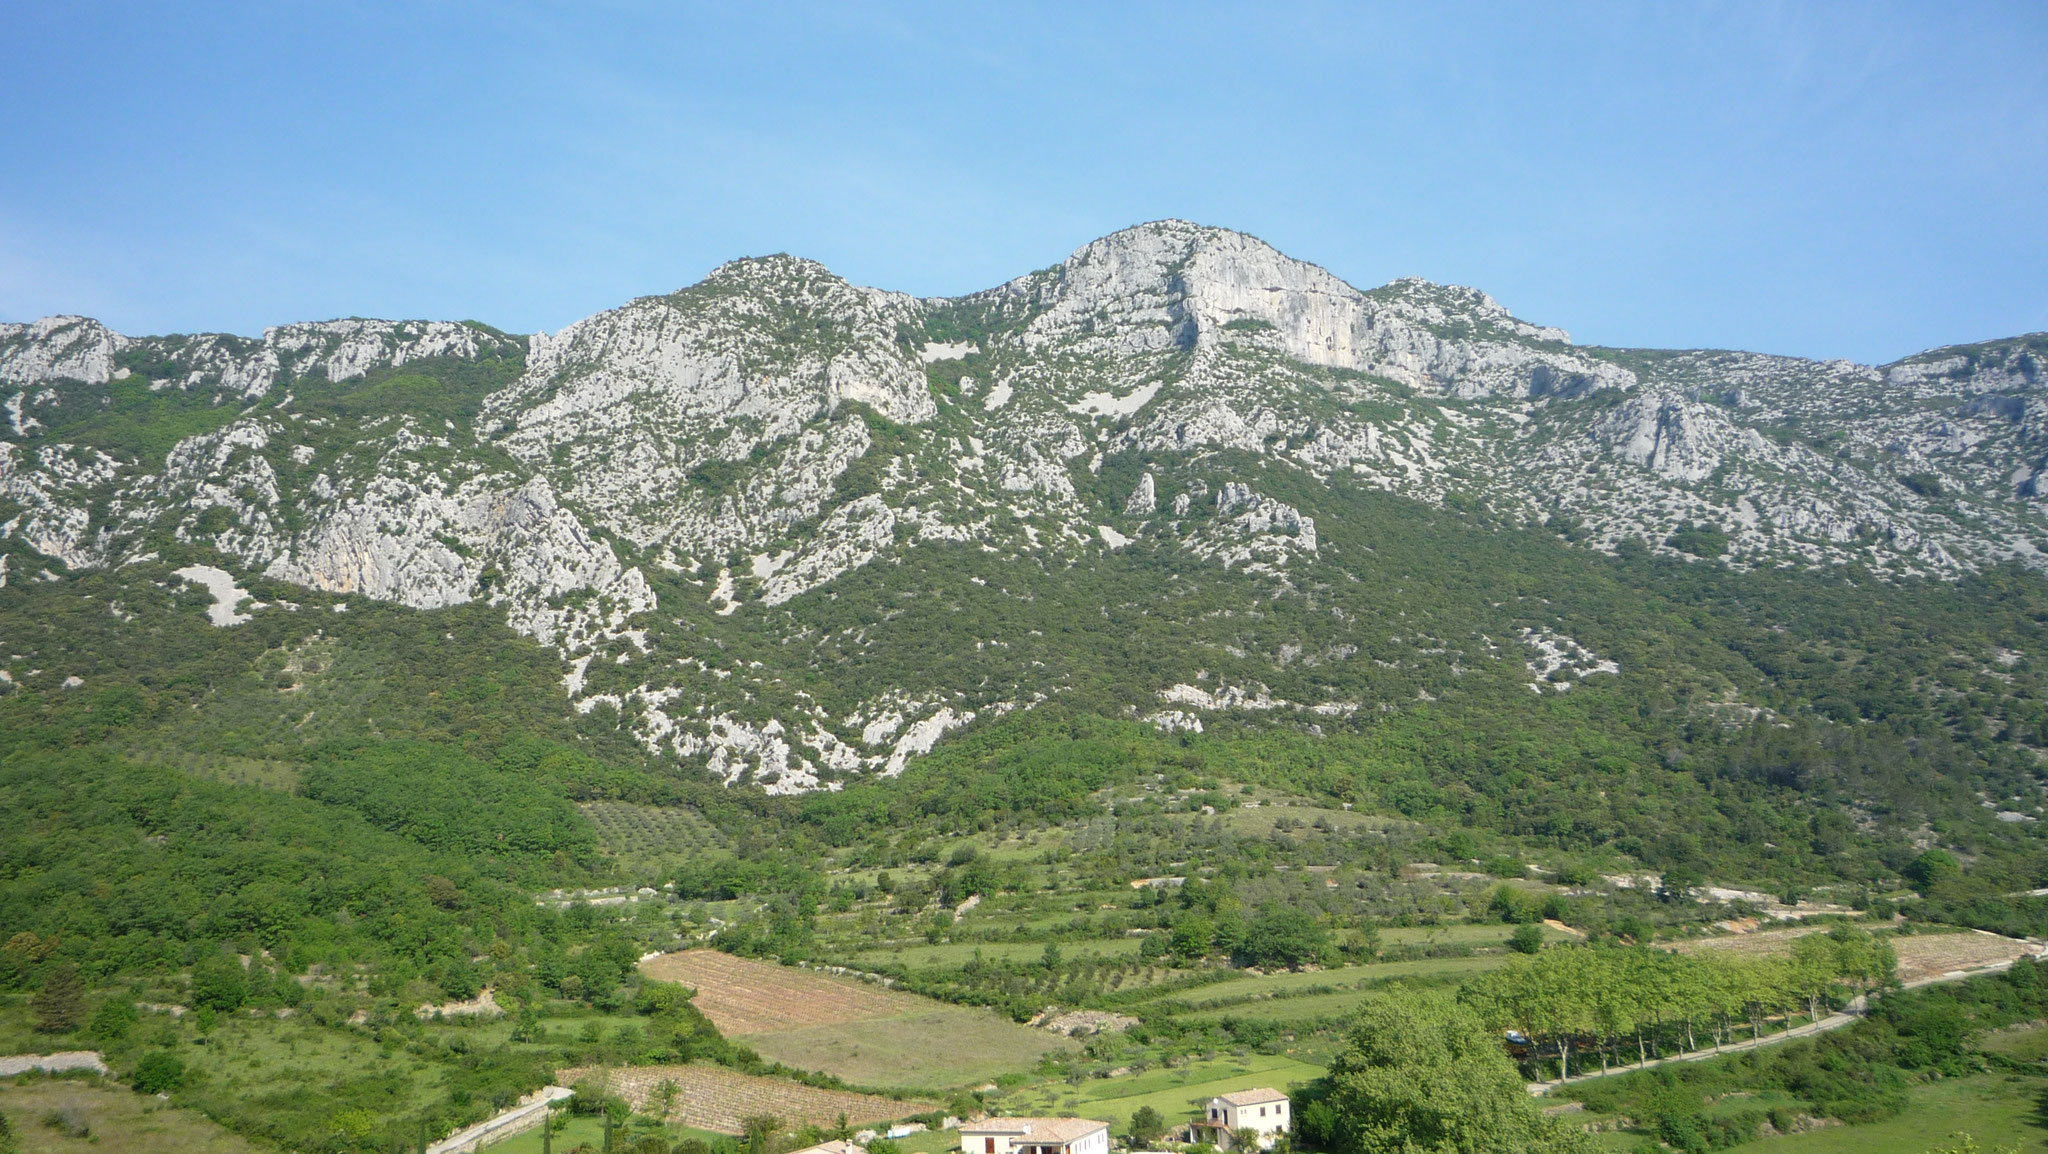 La Seranne, barre rocheuse qui protège la vallée